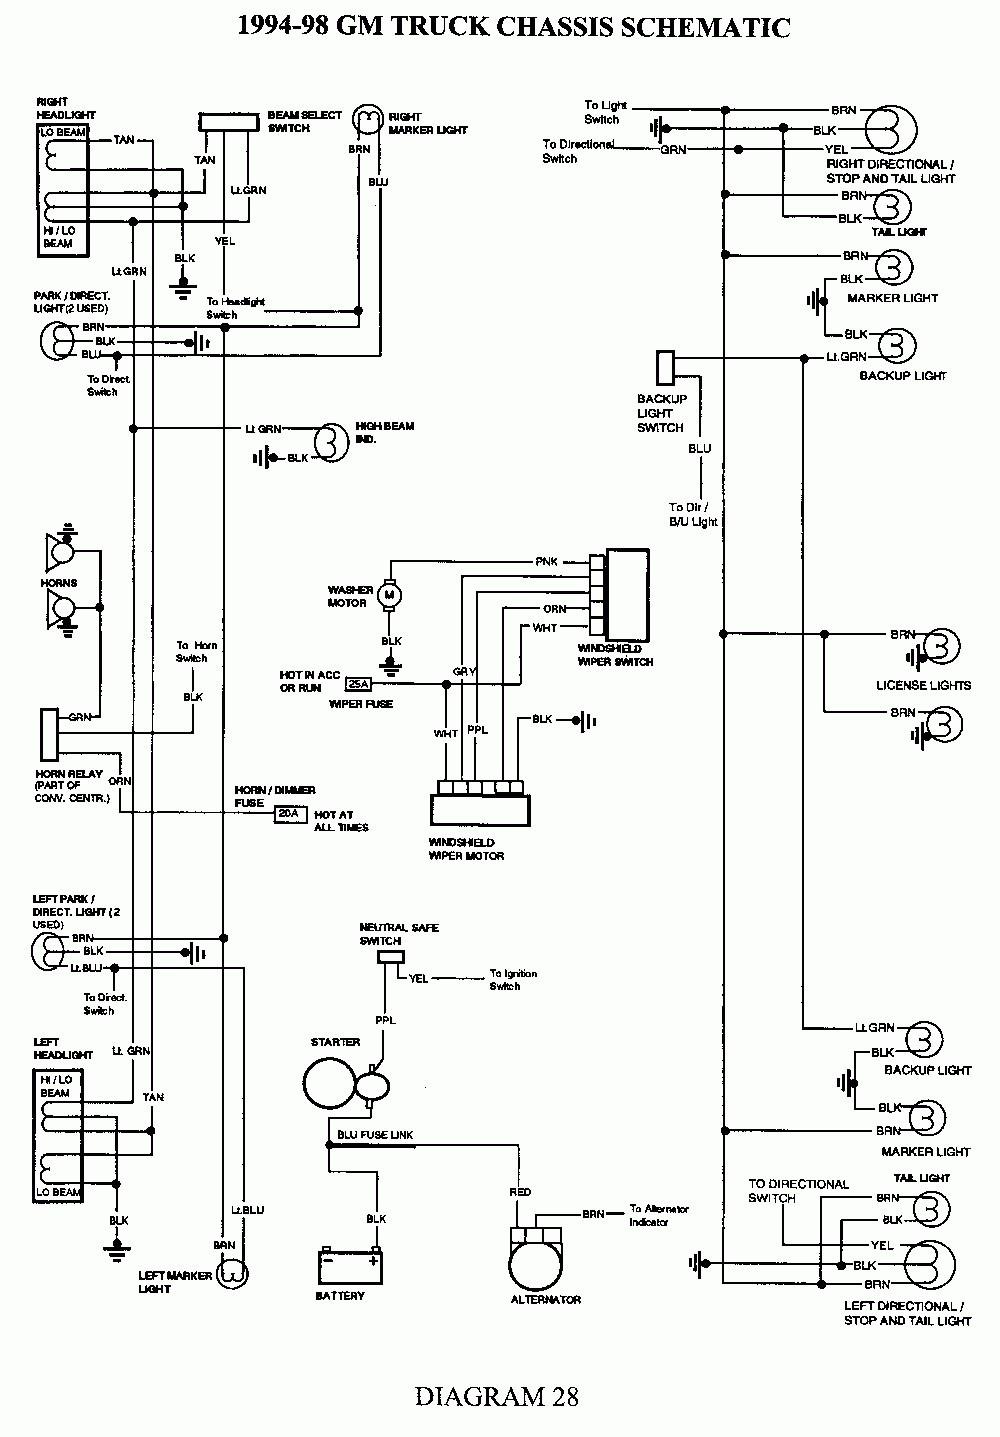 Gk 2418 1994 S10 Rear Wiper Motor Wiring Diagram 1995 Chevrolet S10 Ca Free Diagram